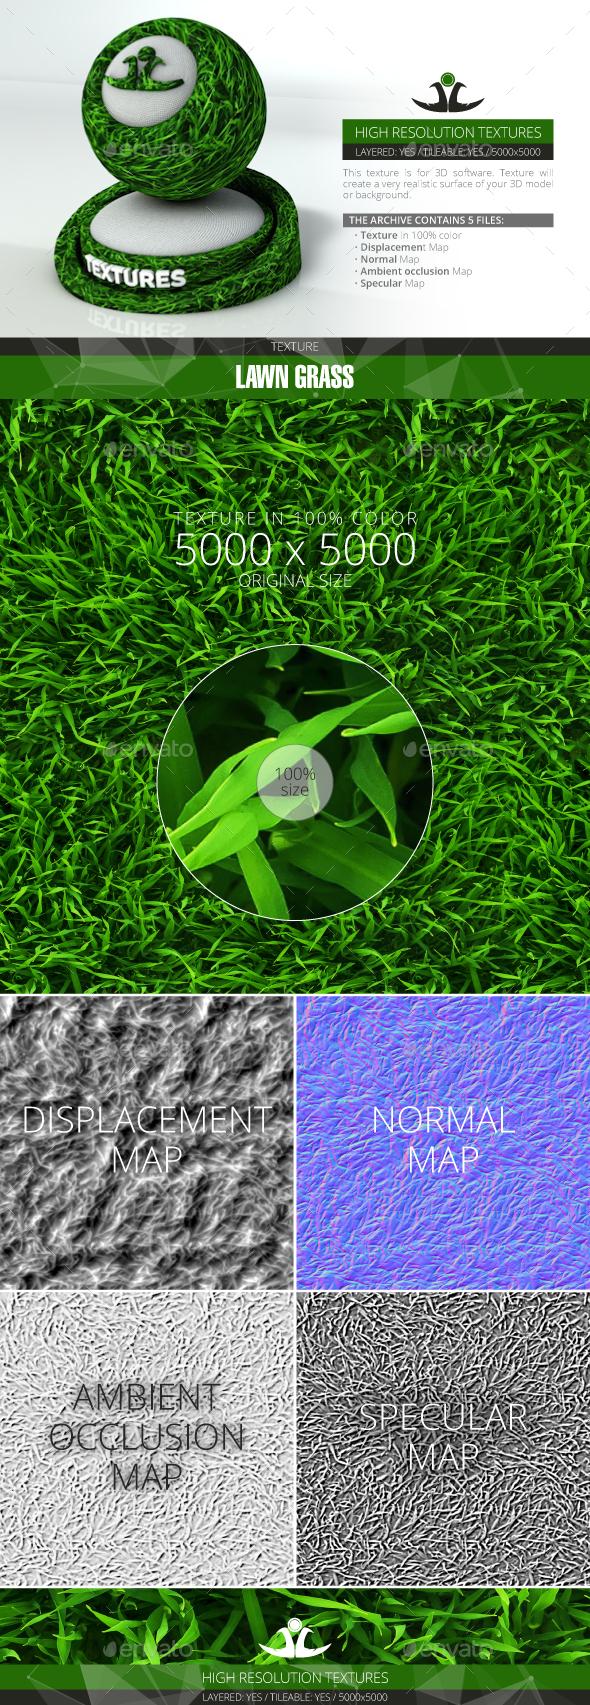 Lawn Grass 6